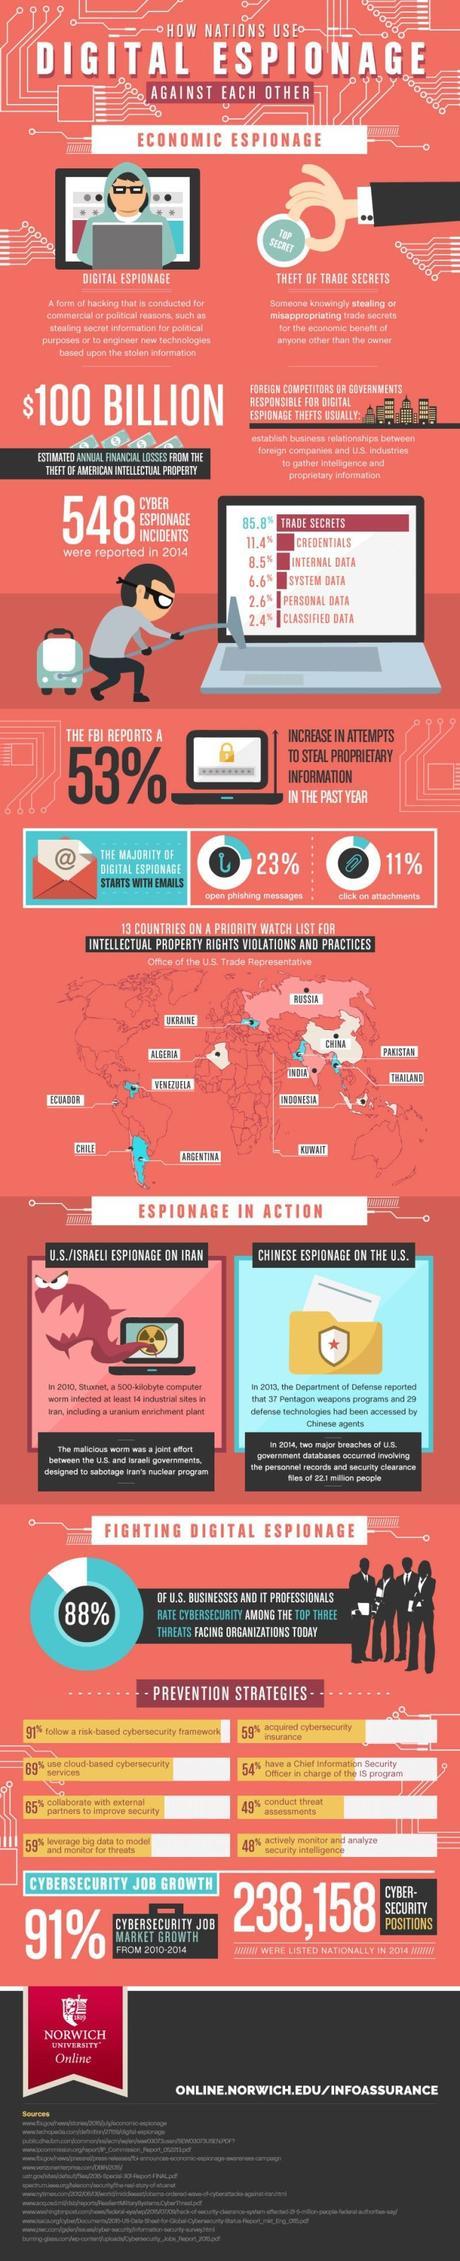 Top Cybersecurity Roles